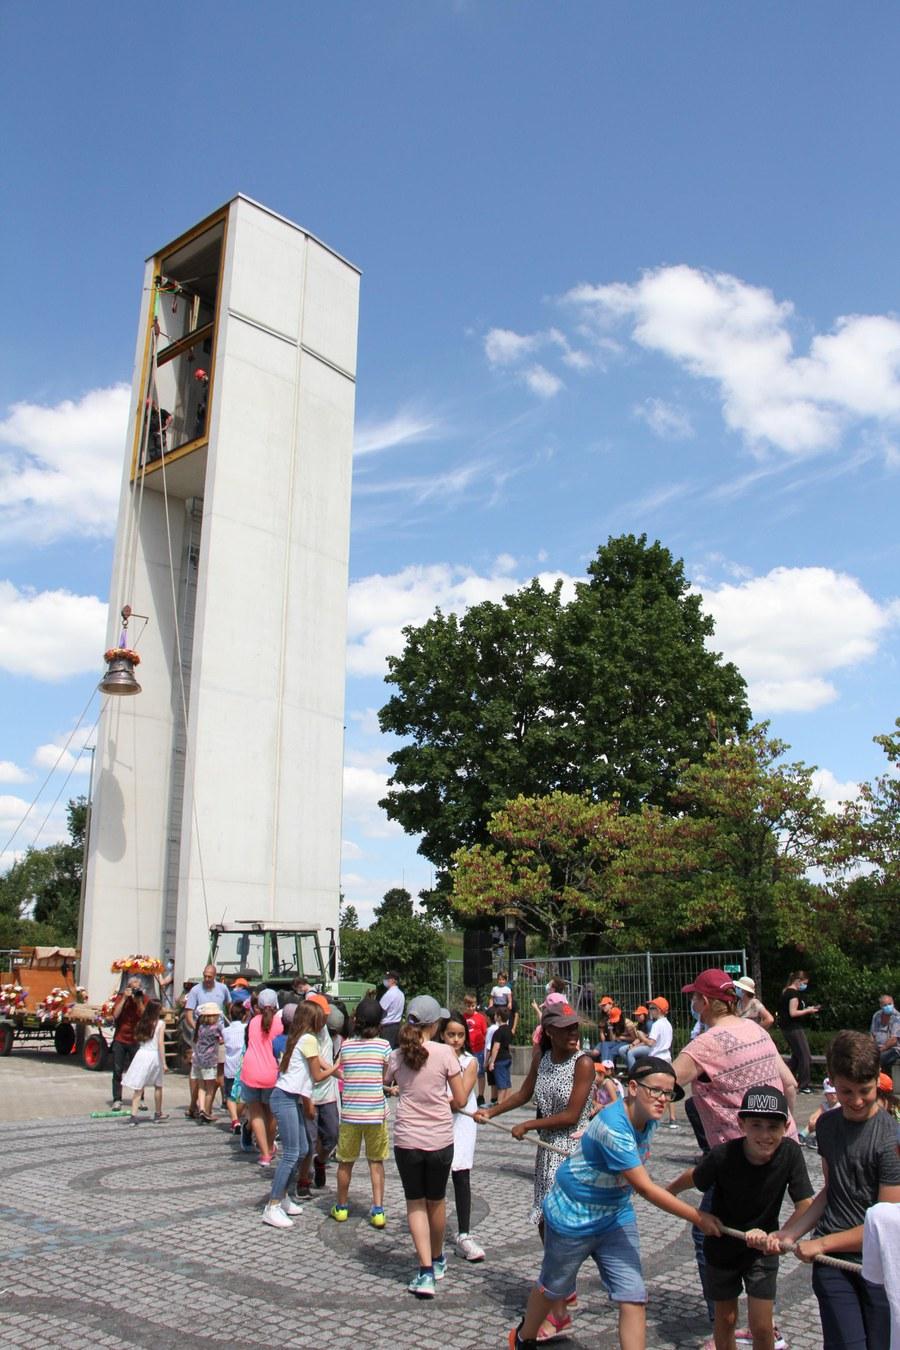 Kinder zogen die Glocken in die Höhe.